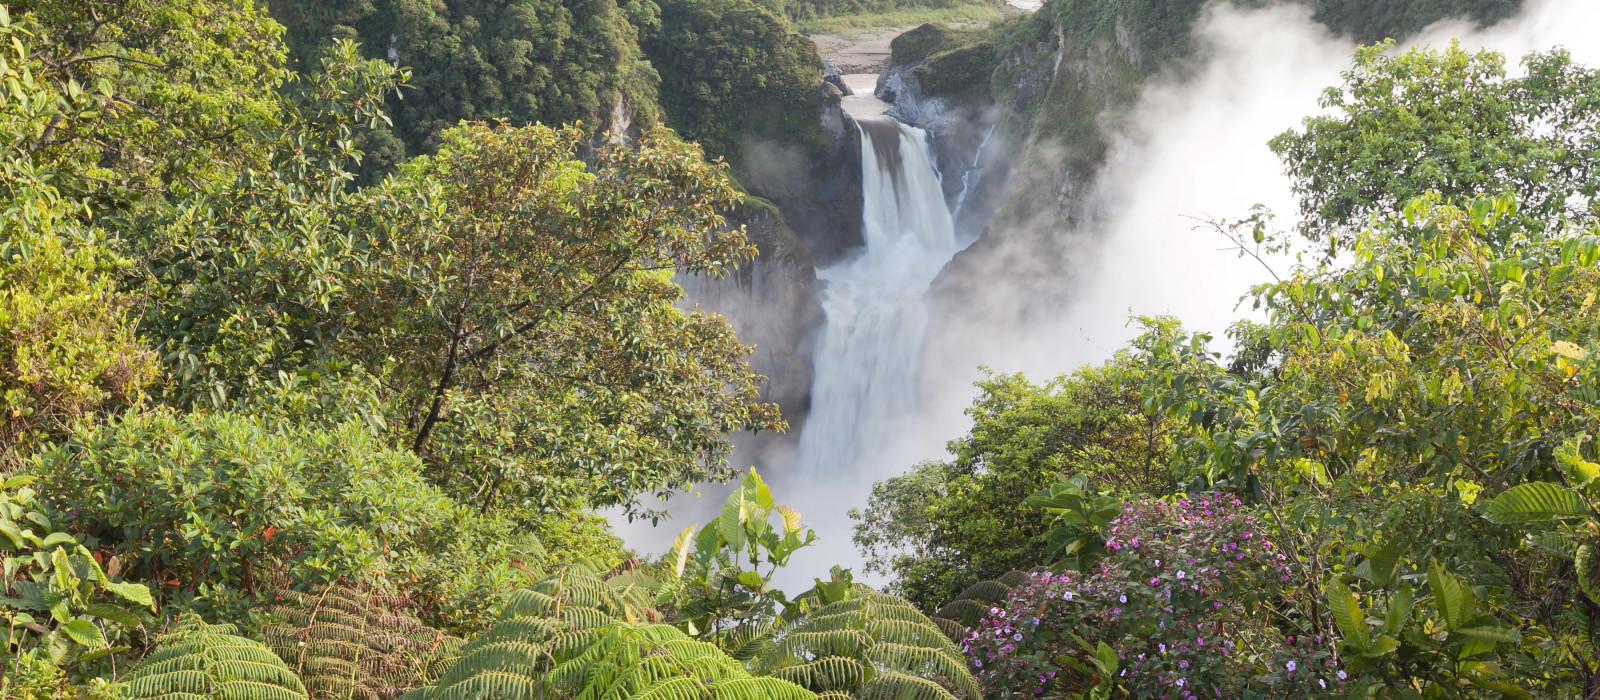 San Rafael Falls größter Wasserfall in Ecuador, Südamerika